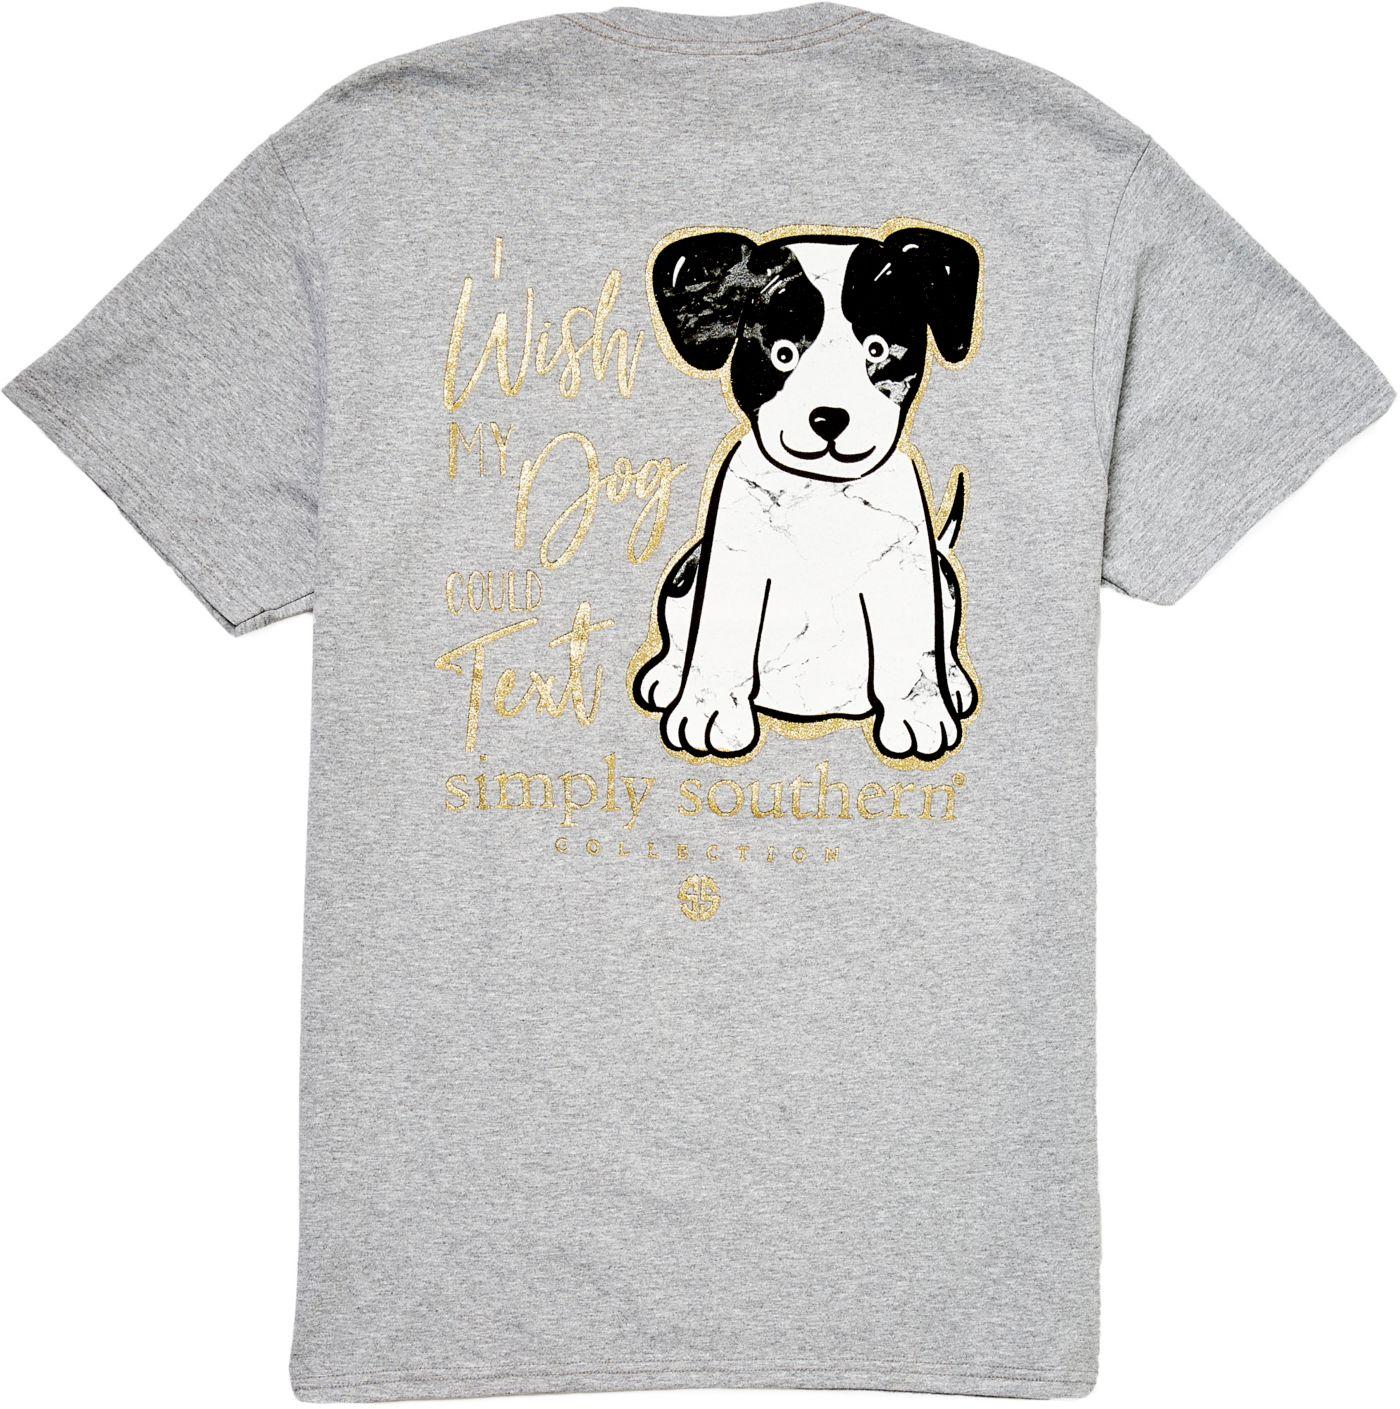 Simply Southern Women's Short Sleeve Text T-Shirt